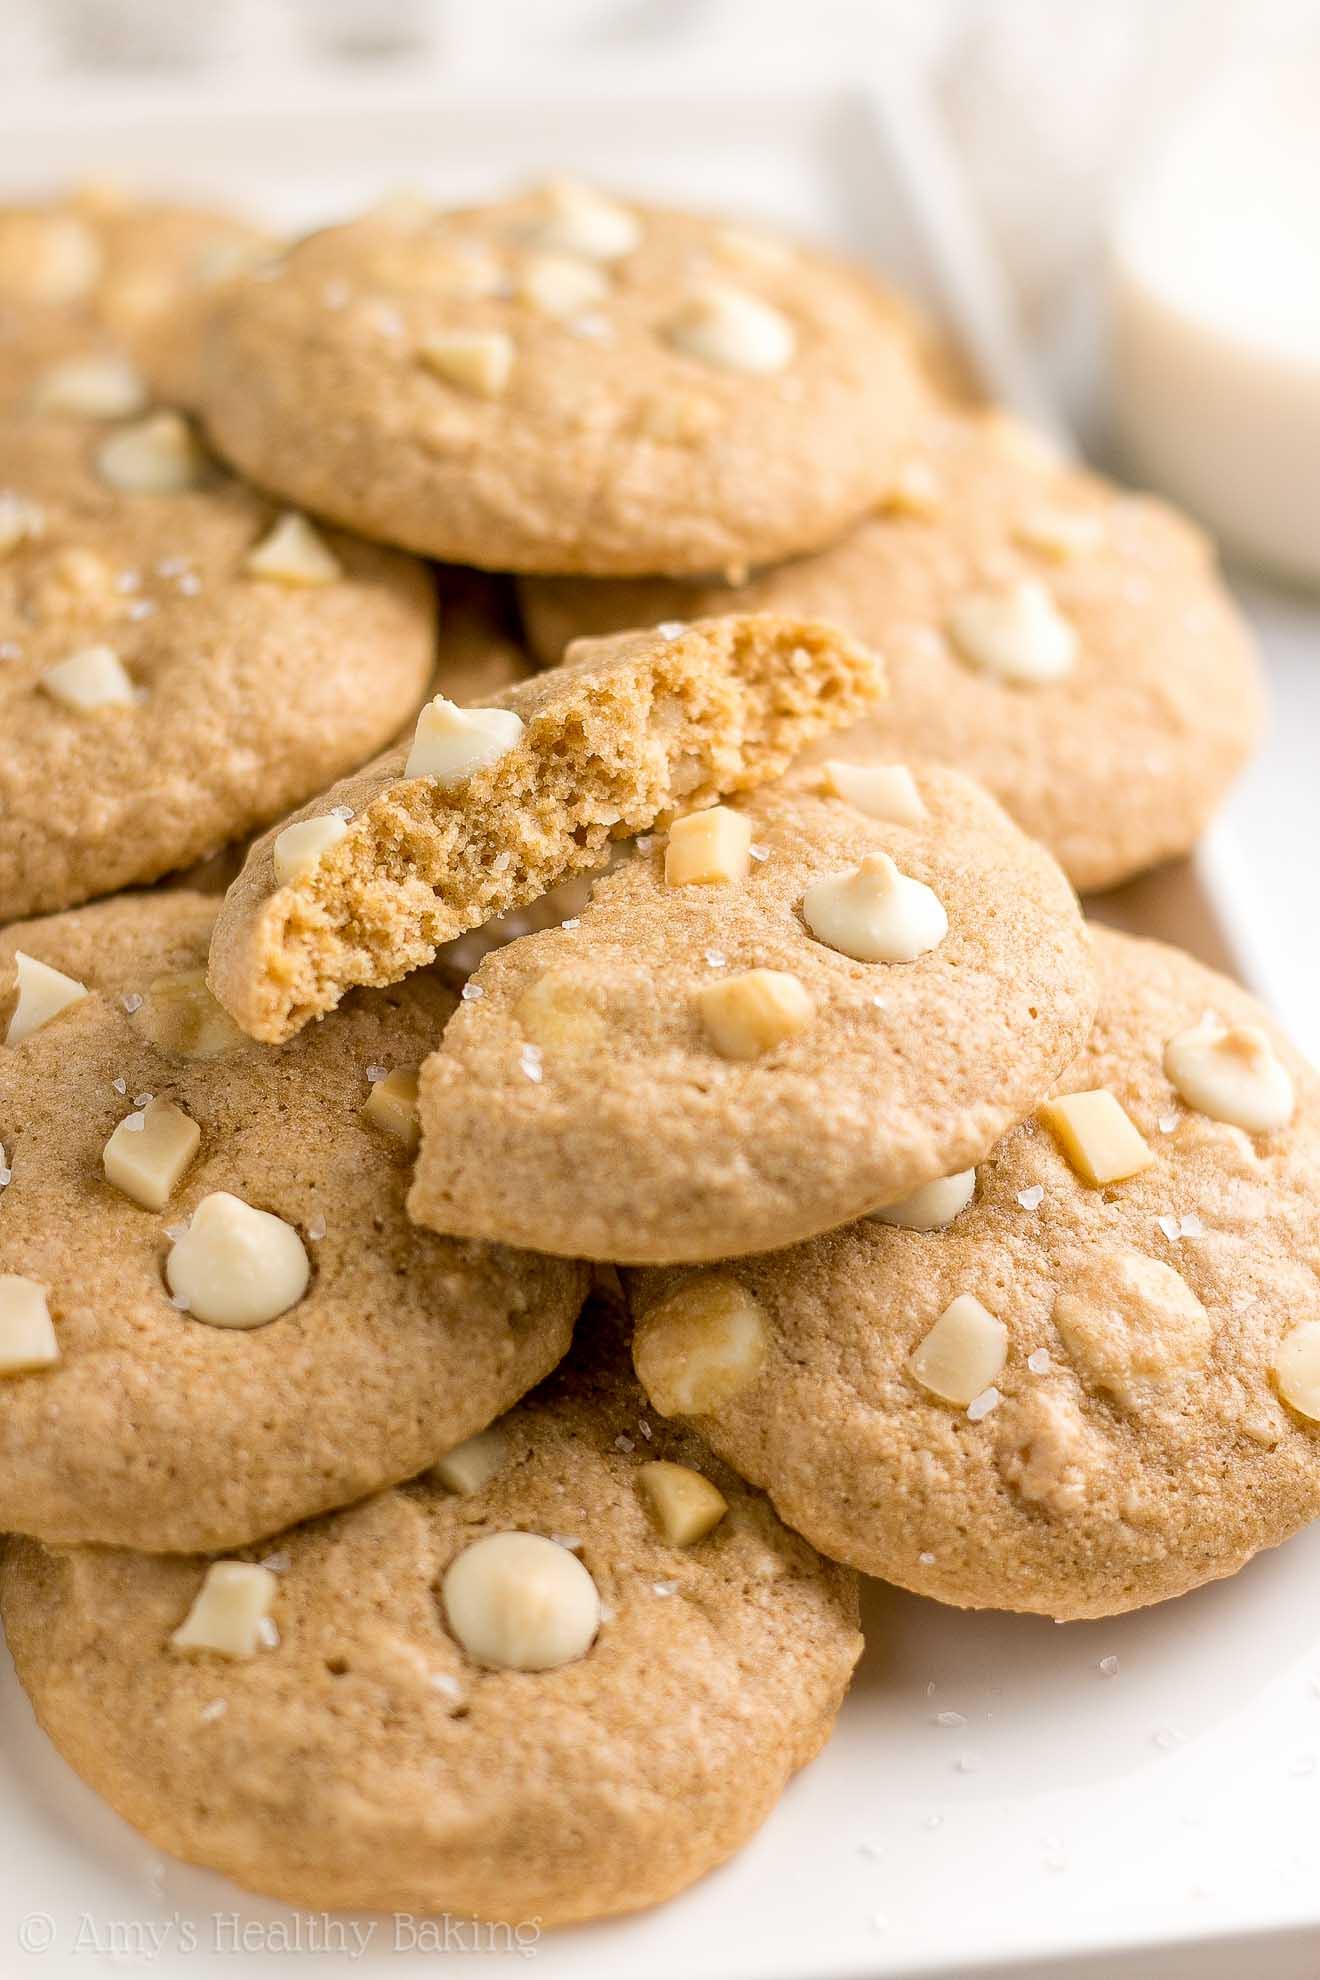 Chocolate Macadamia Nut Cookies  The Ultimate Healthy White Chocolate Macadamia Nut Cookies